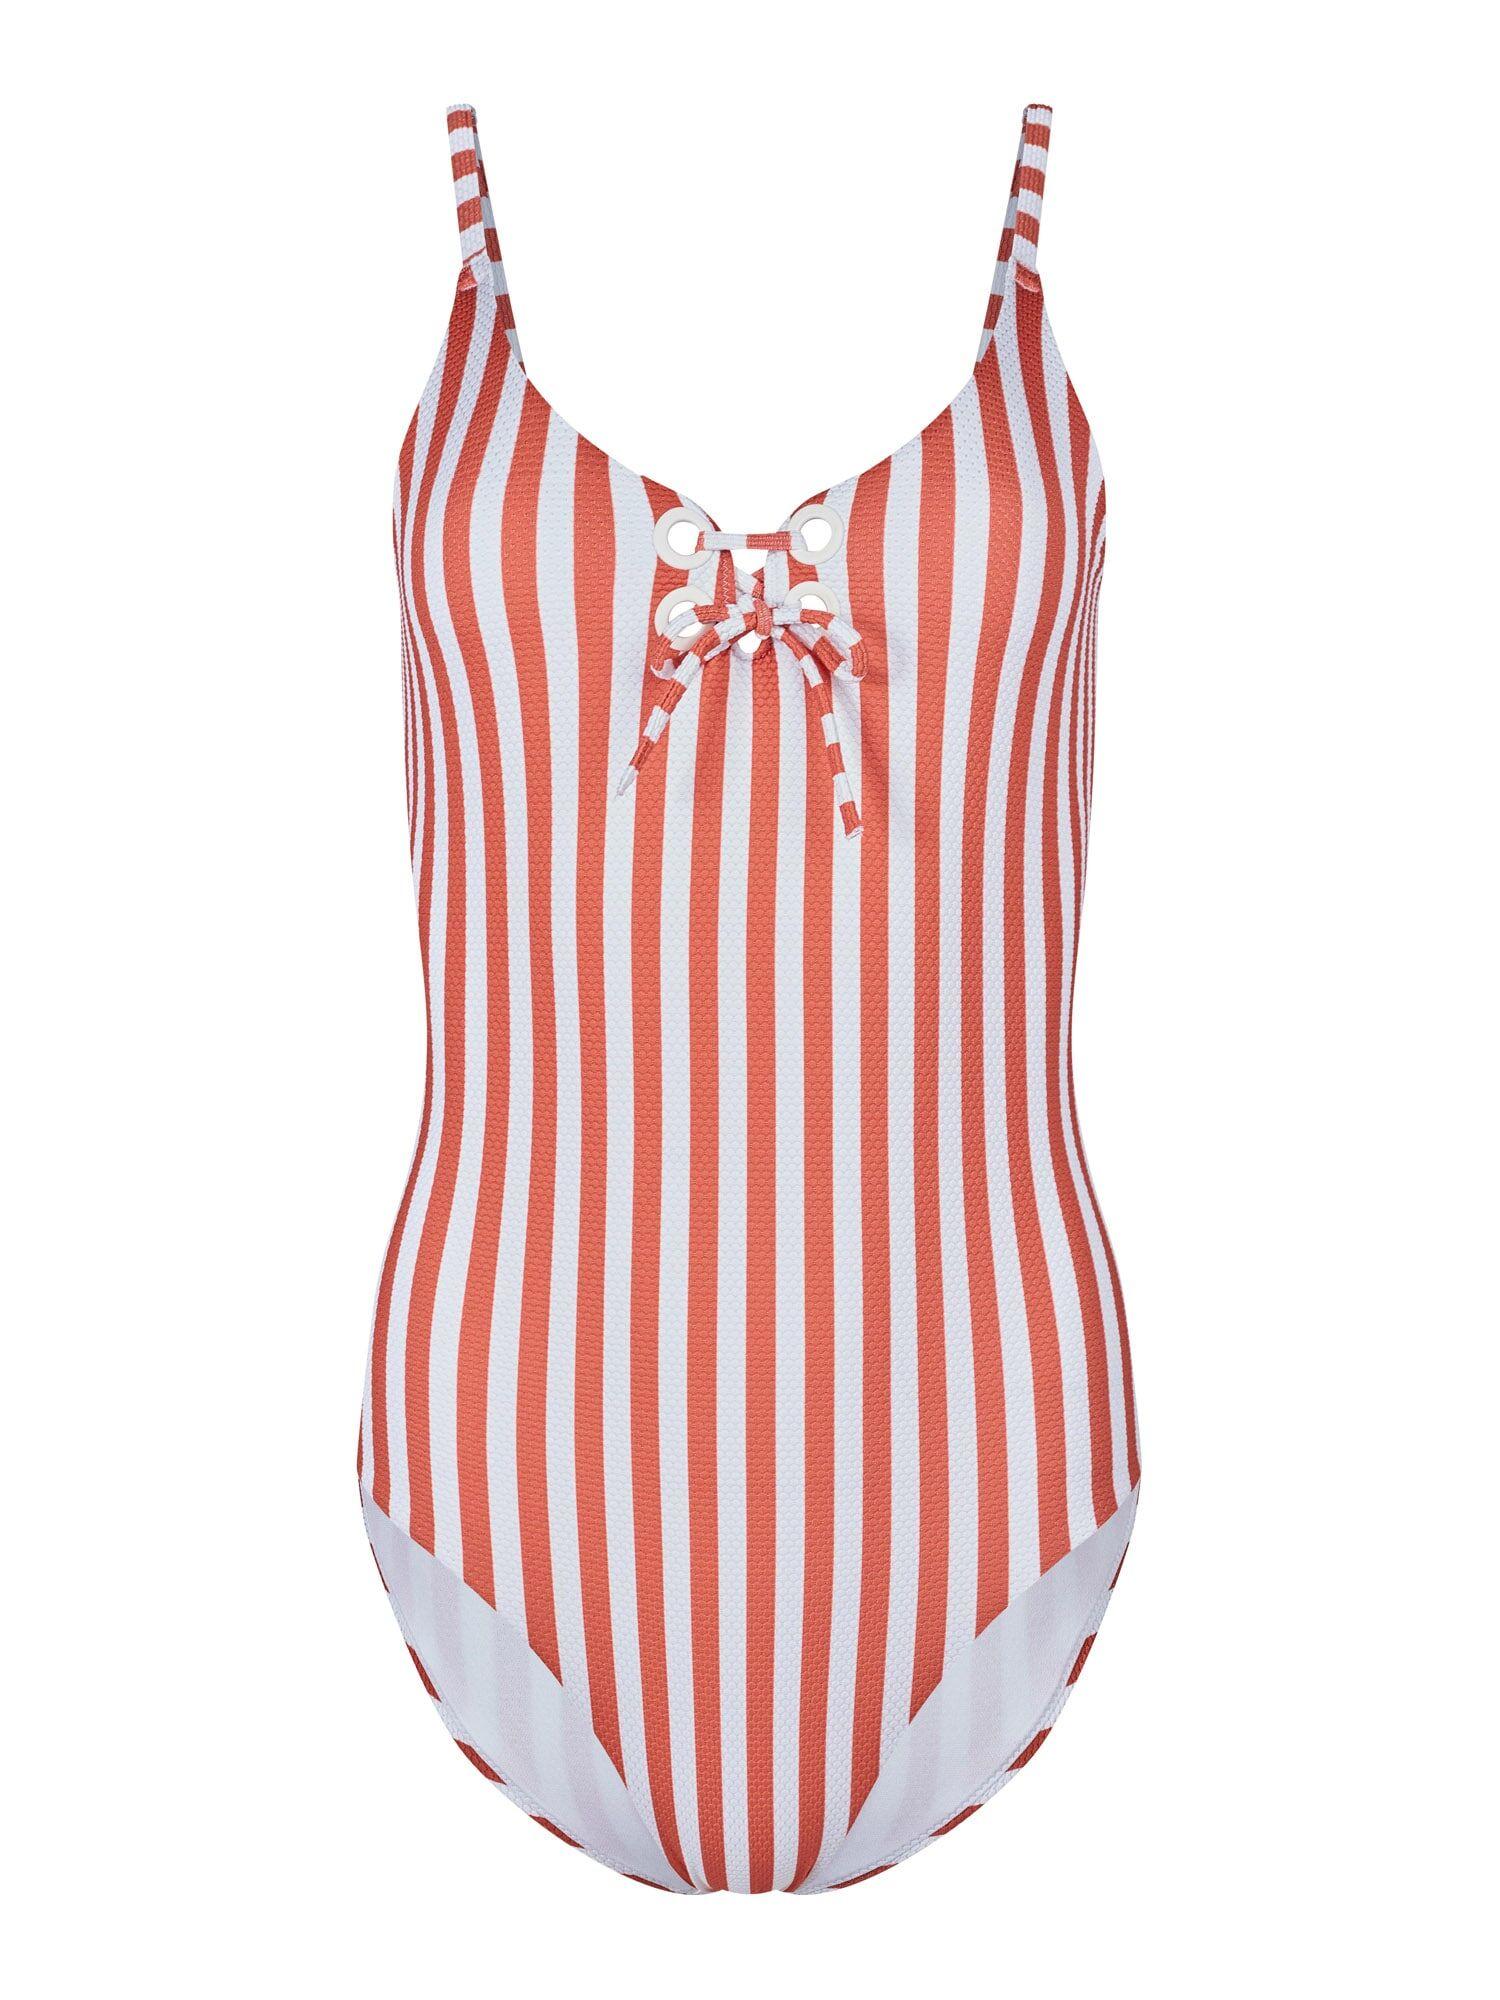 Skiny Maillot de bain 'Surf Girl'  - Orange, Blanc - Taille: 40 - female